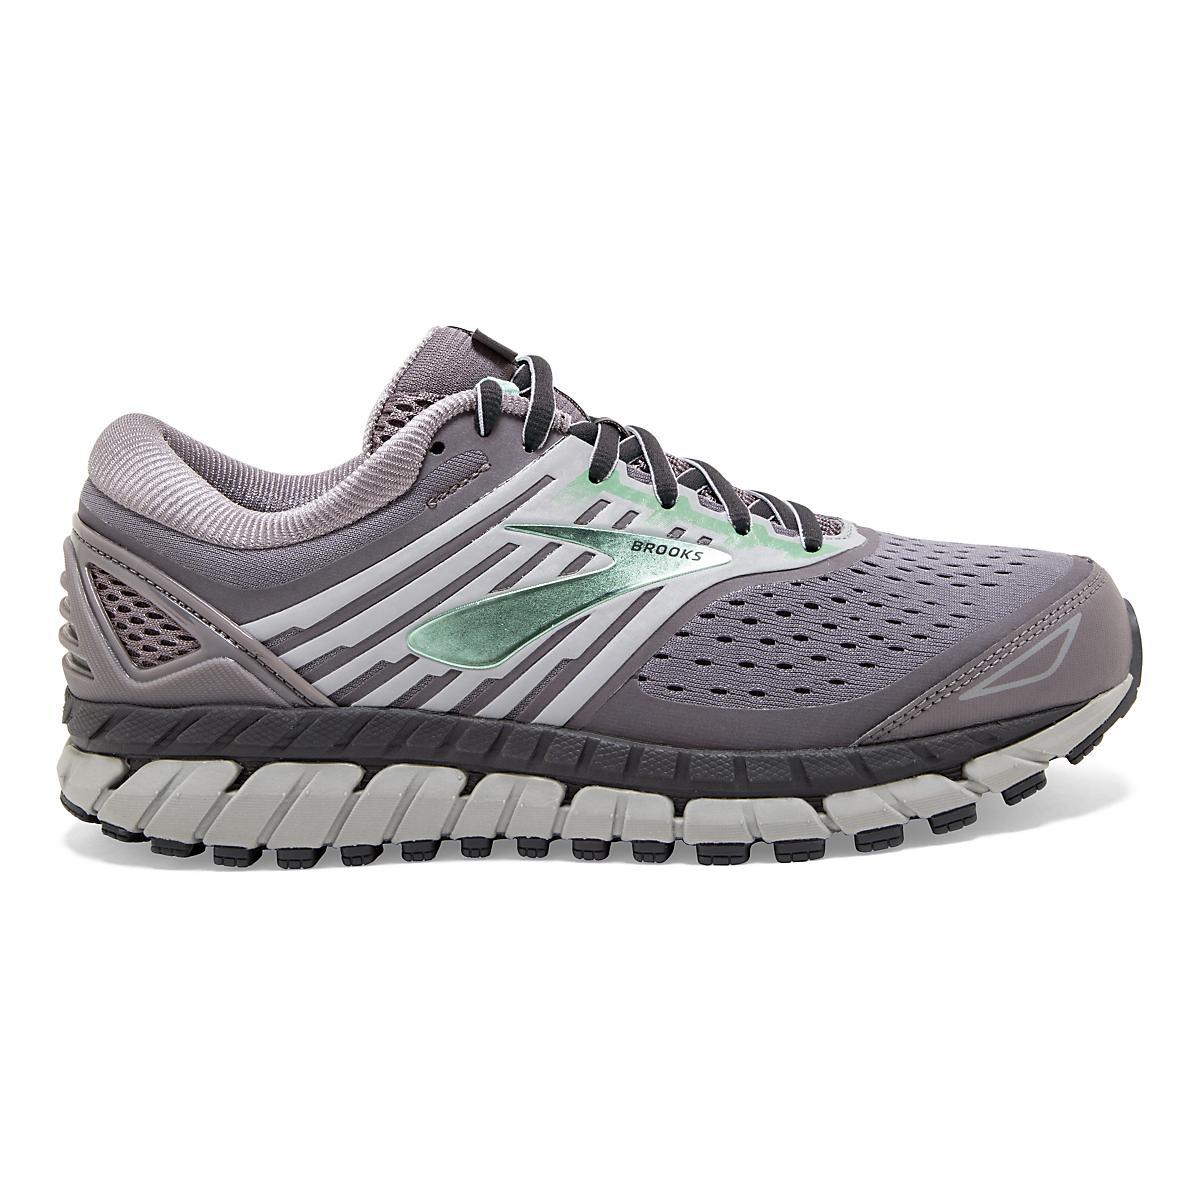 aa712da2023 Womens Brooks Ariel 18 Running Shoe at Road Runner Sports